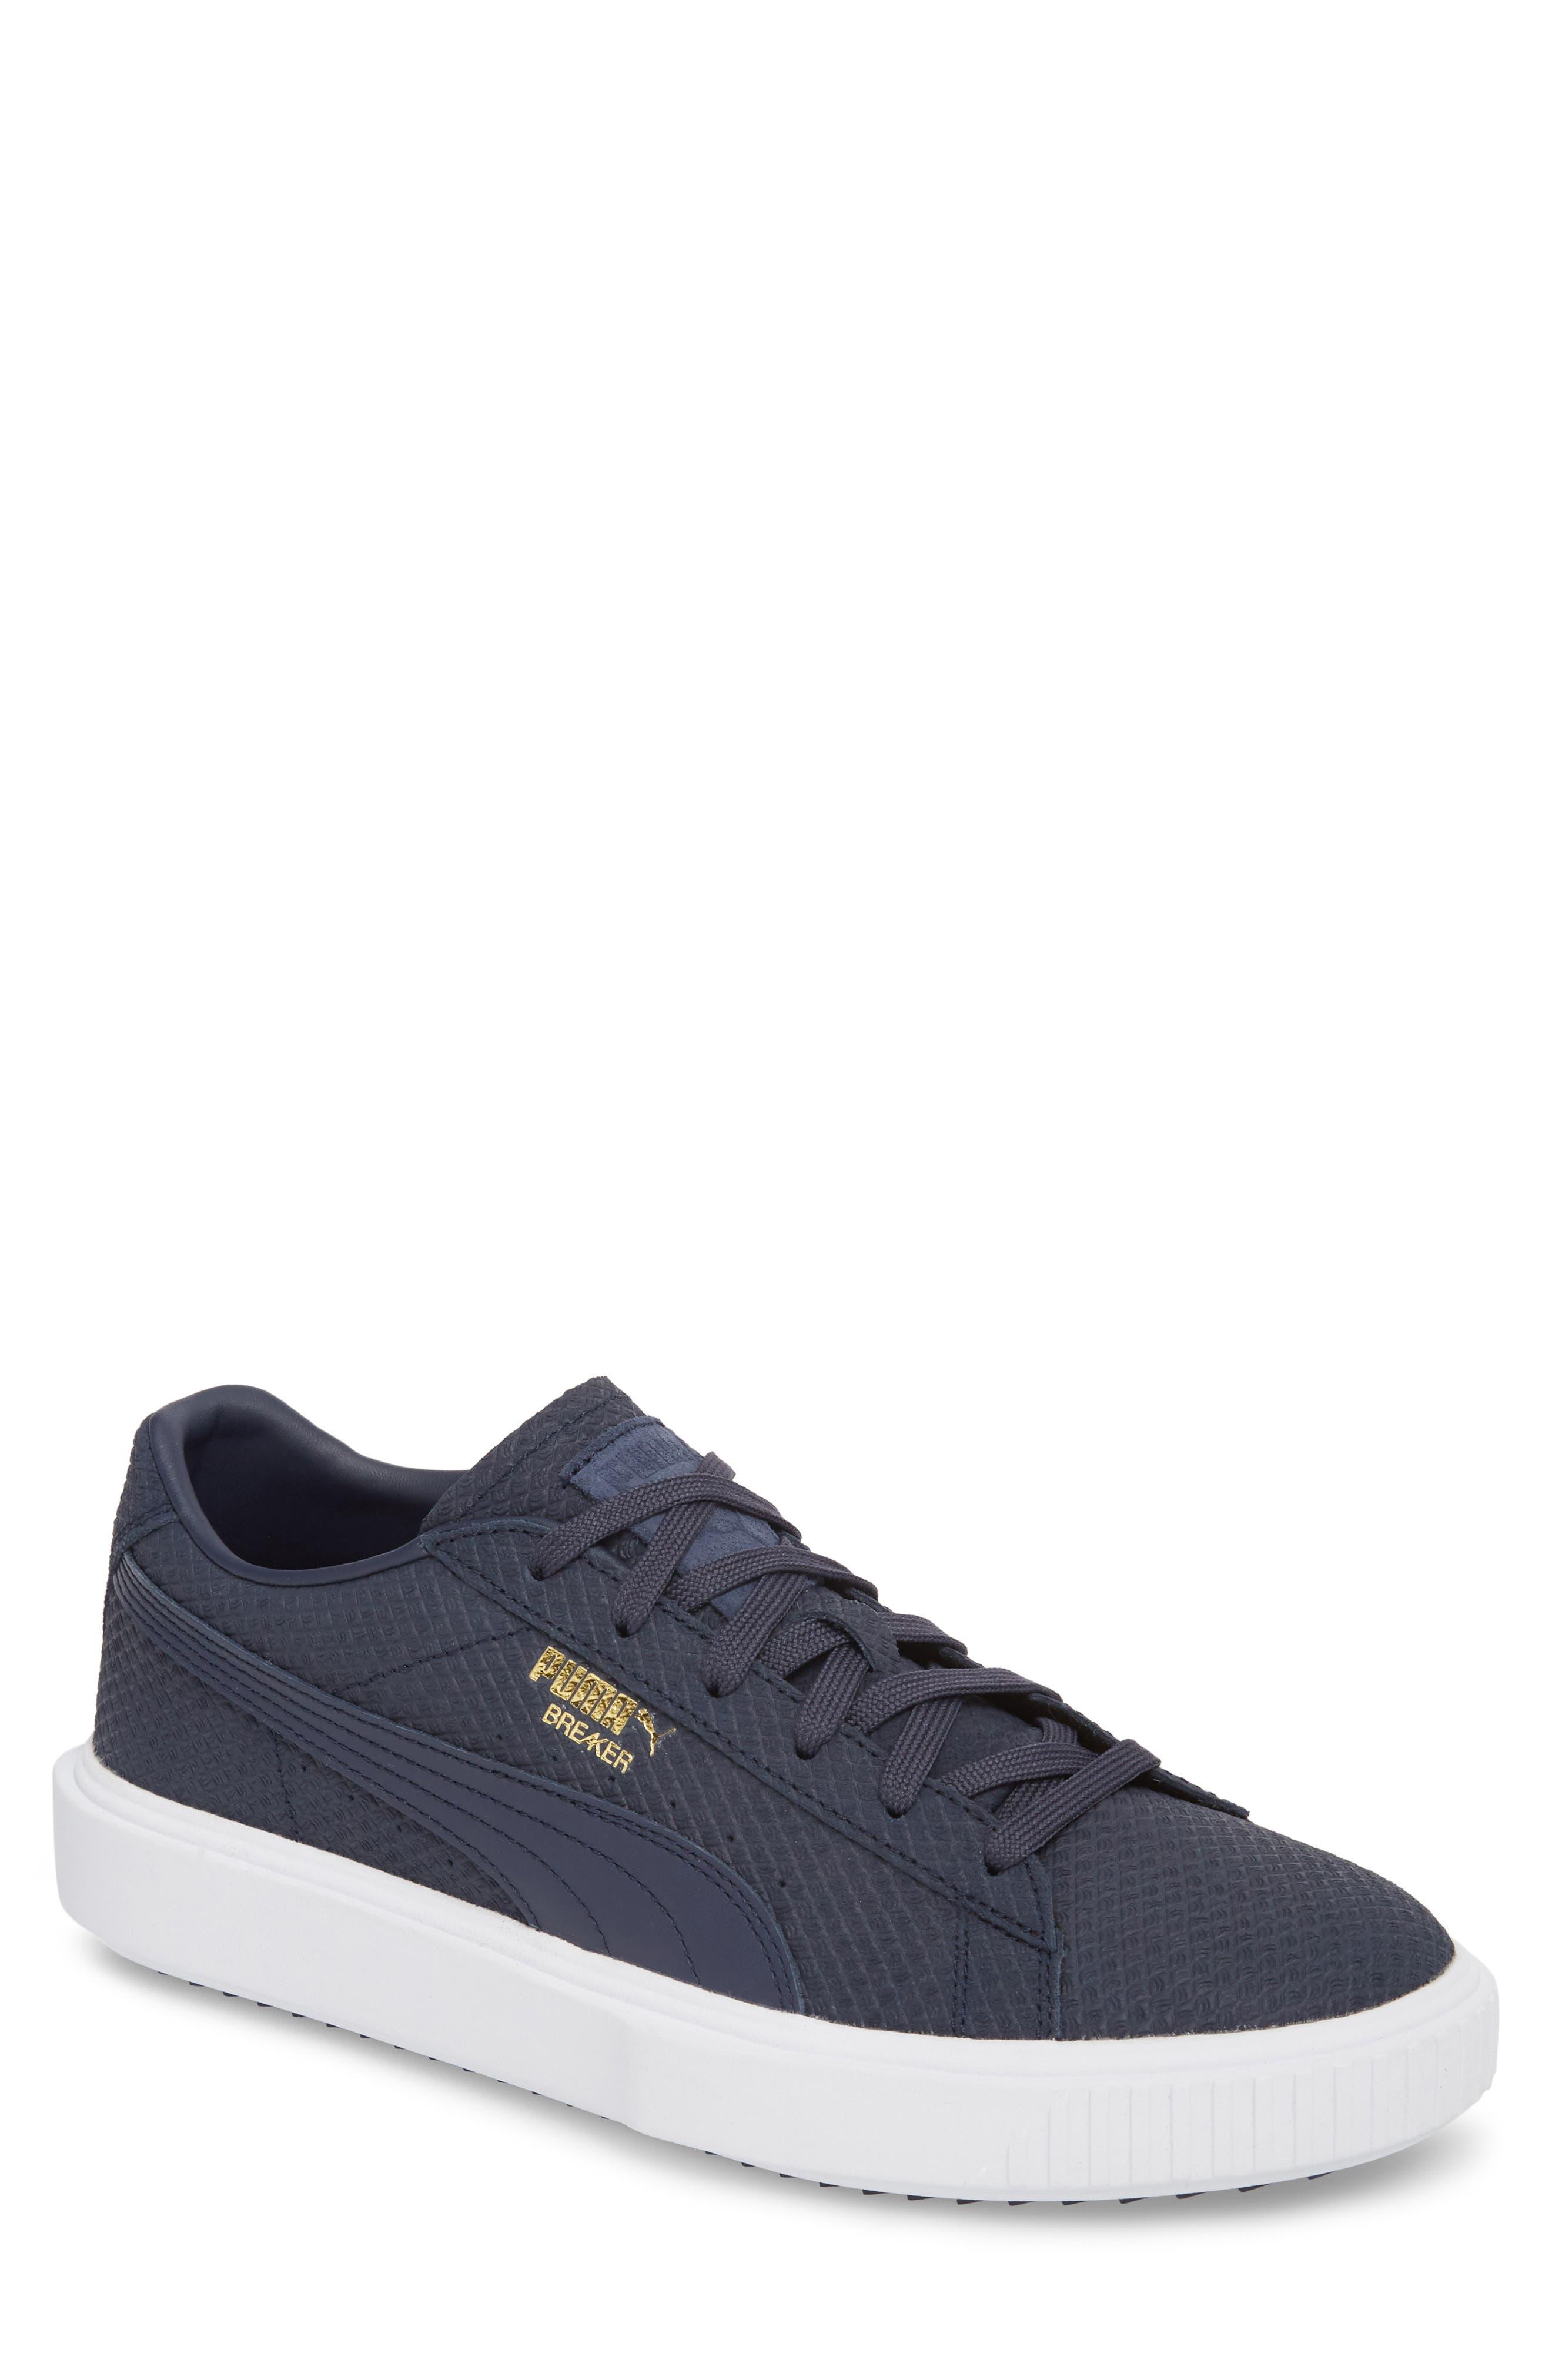 Breaker Suede Sneaker,                             Main thumbnail 1, color,                             400